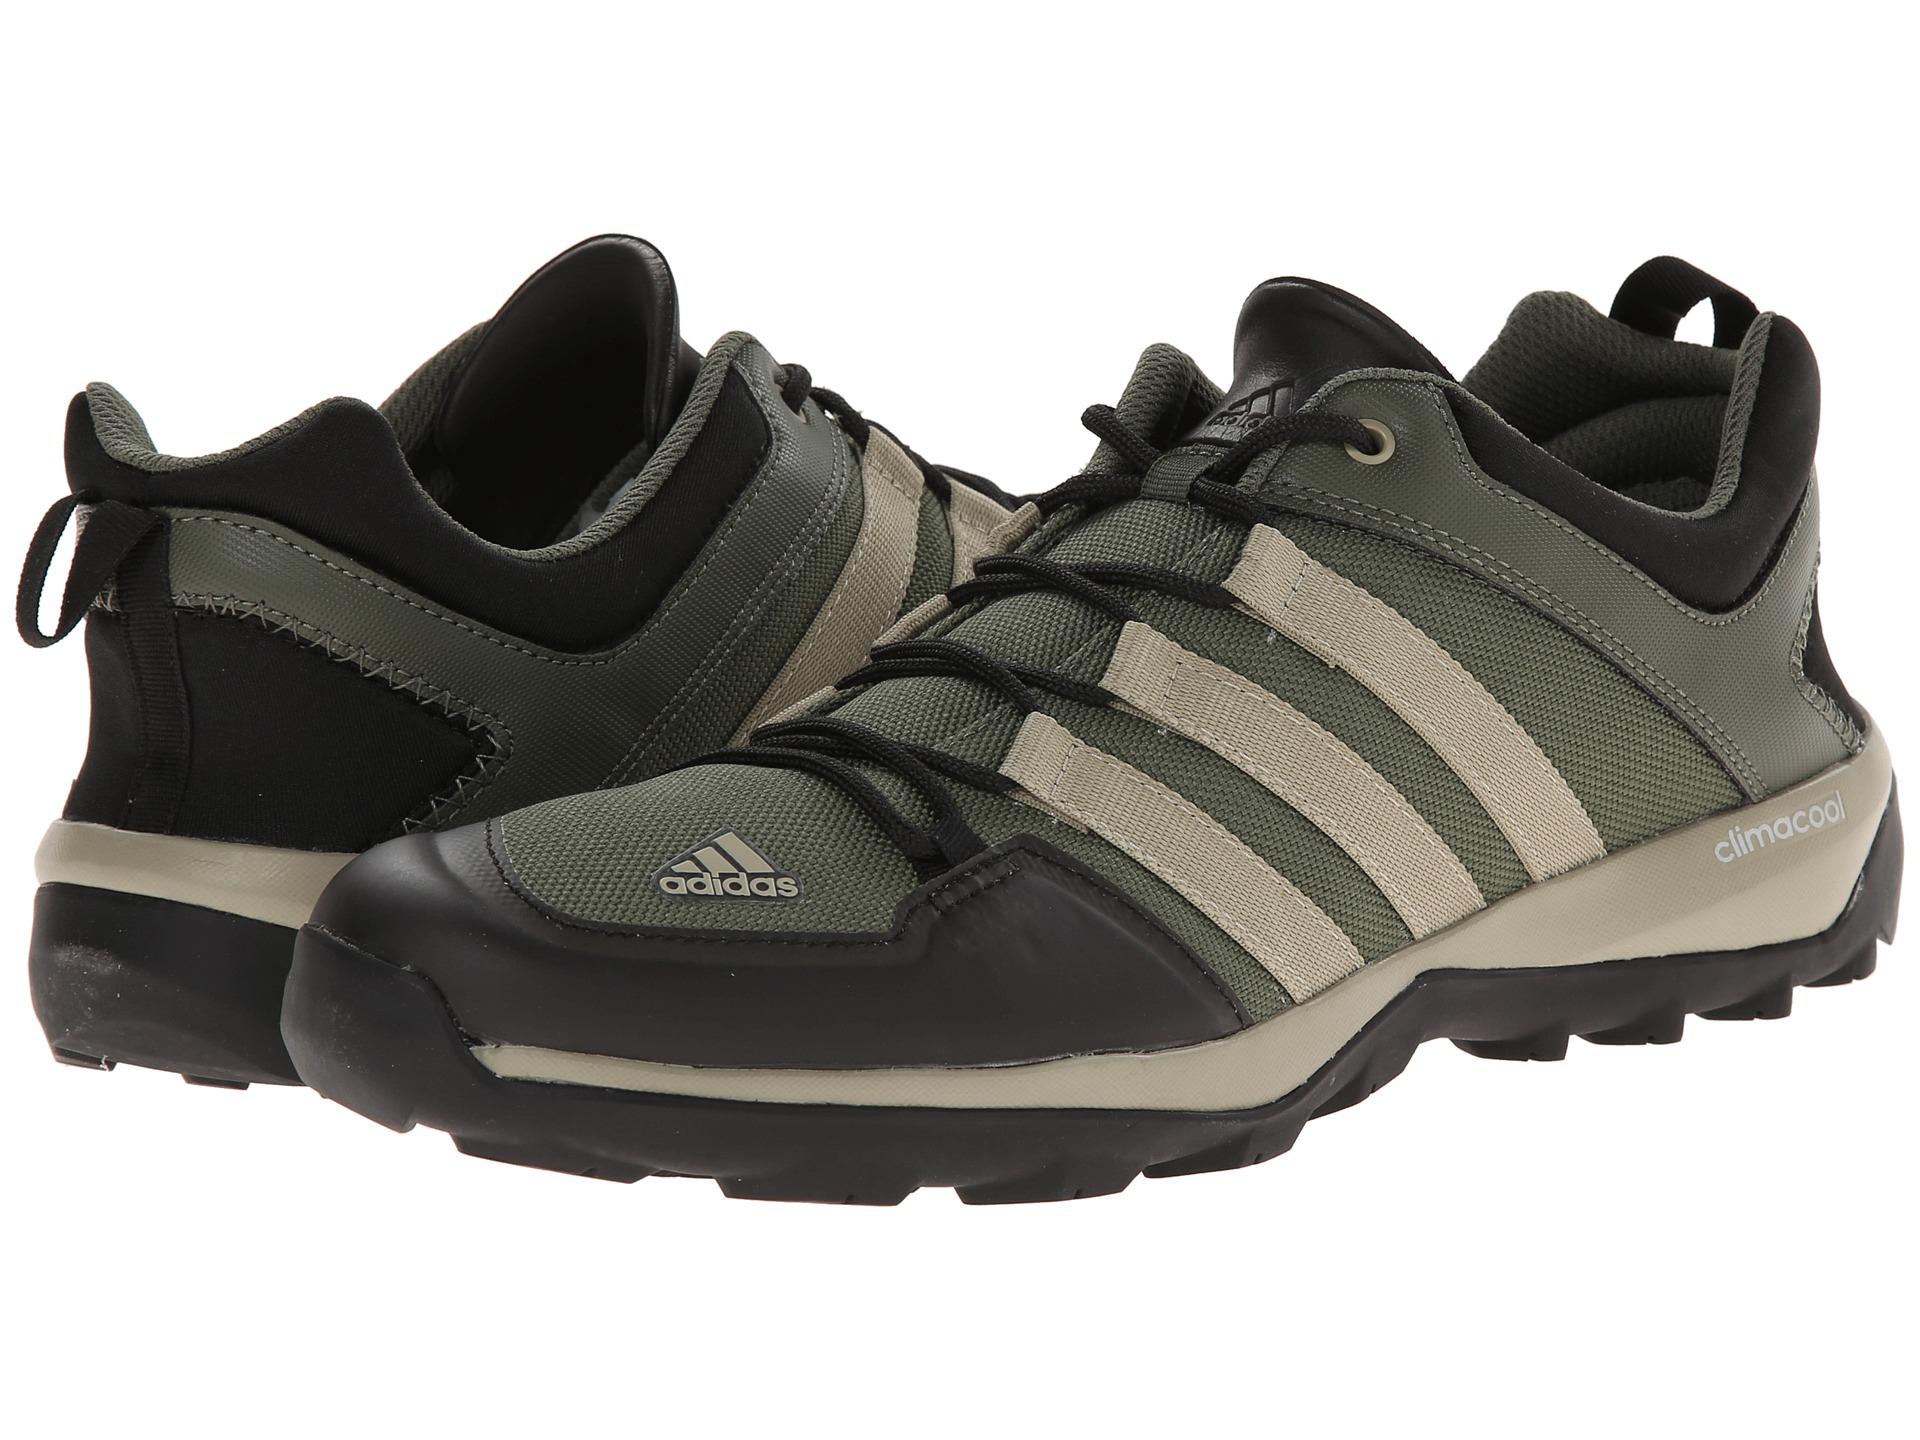 Adidas Daroga Shoes Online